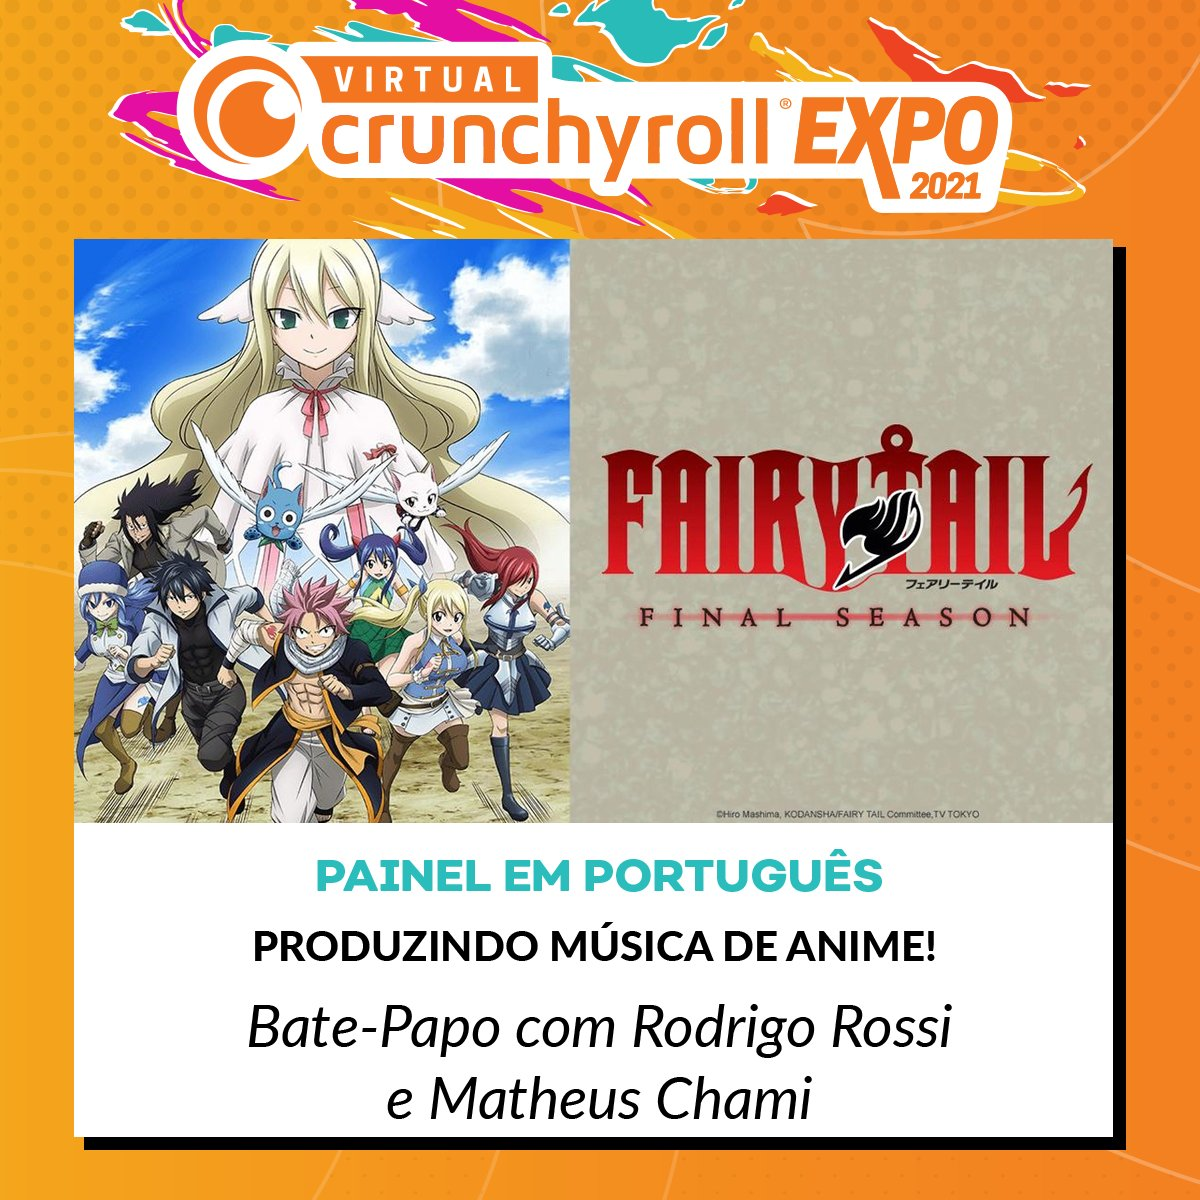 E7ULrNQWEAAb0 i?format=jpg&name=medium - Crunchyroll anuncia painéis para o público brasileiro no Virtual Crunchyroll Expo